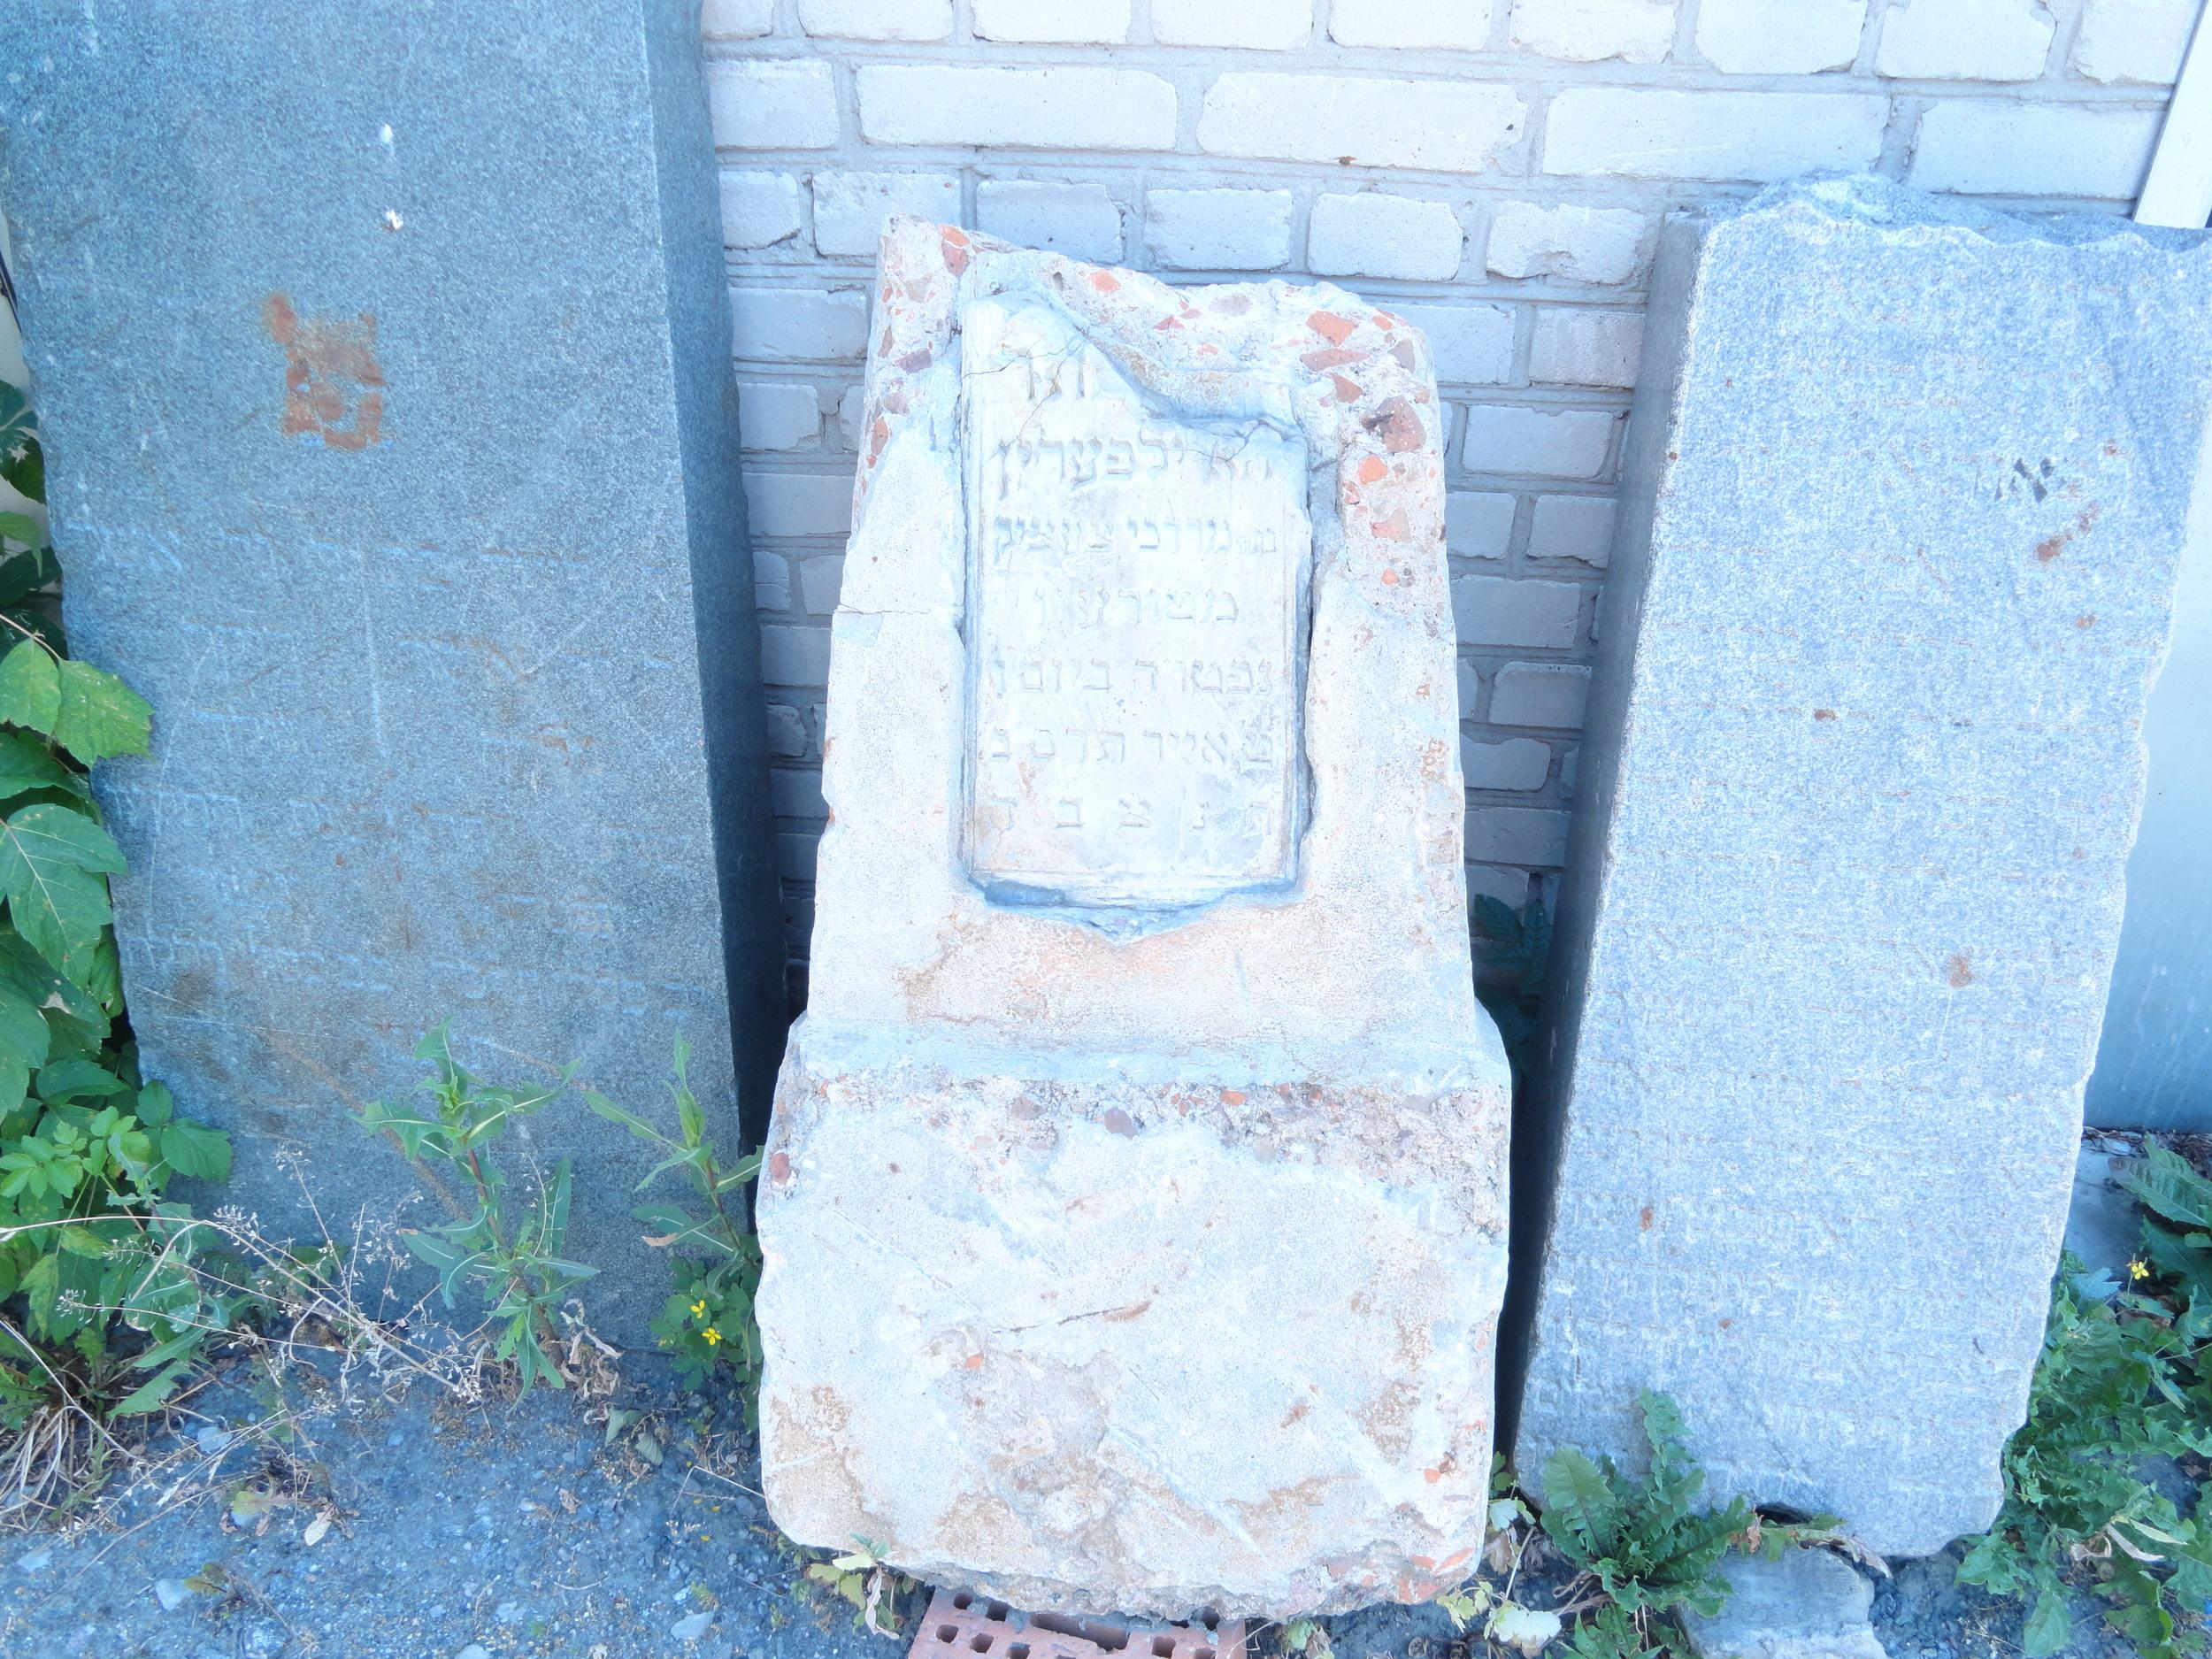 Pinsk Jewish grave stones